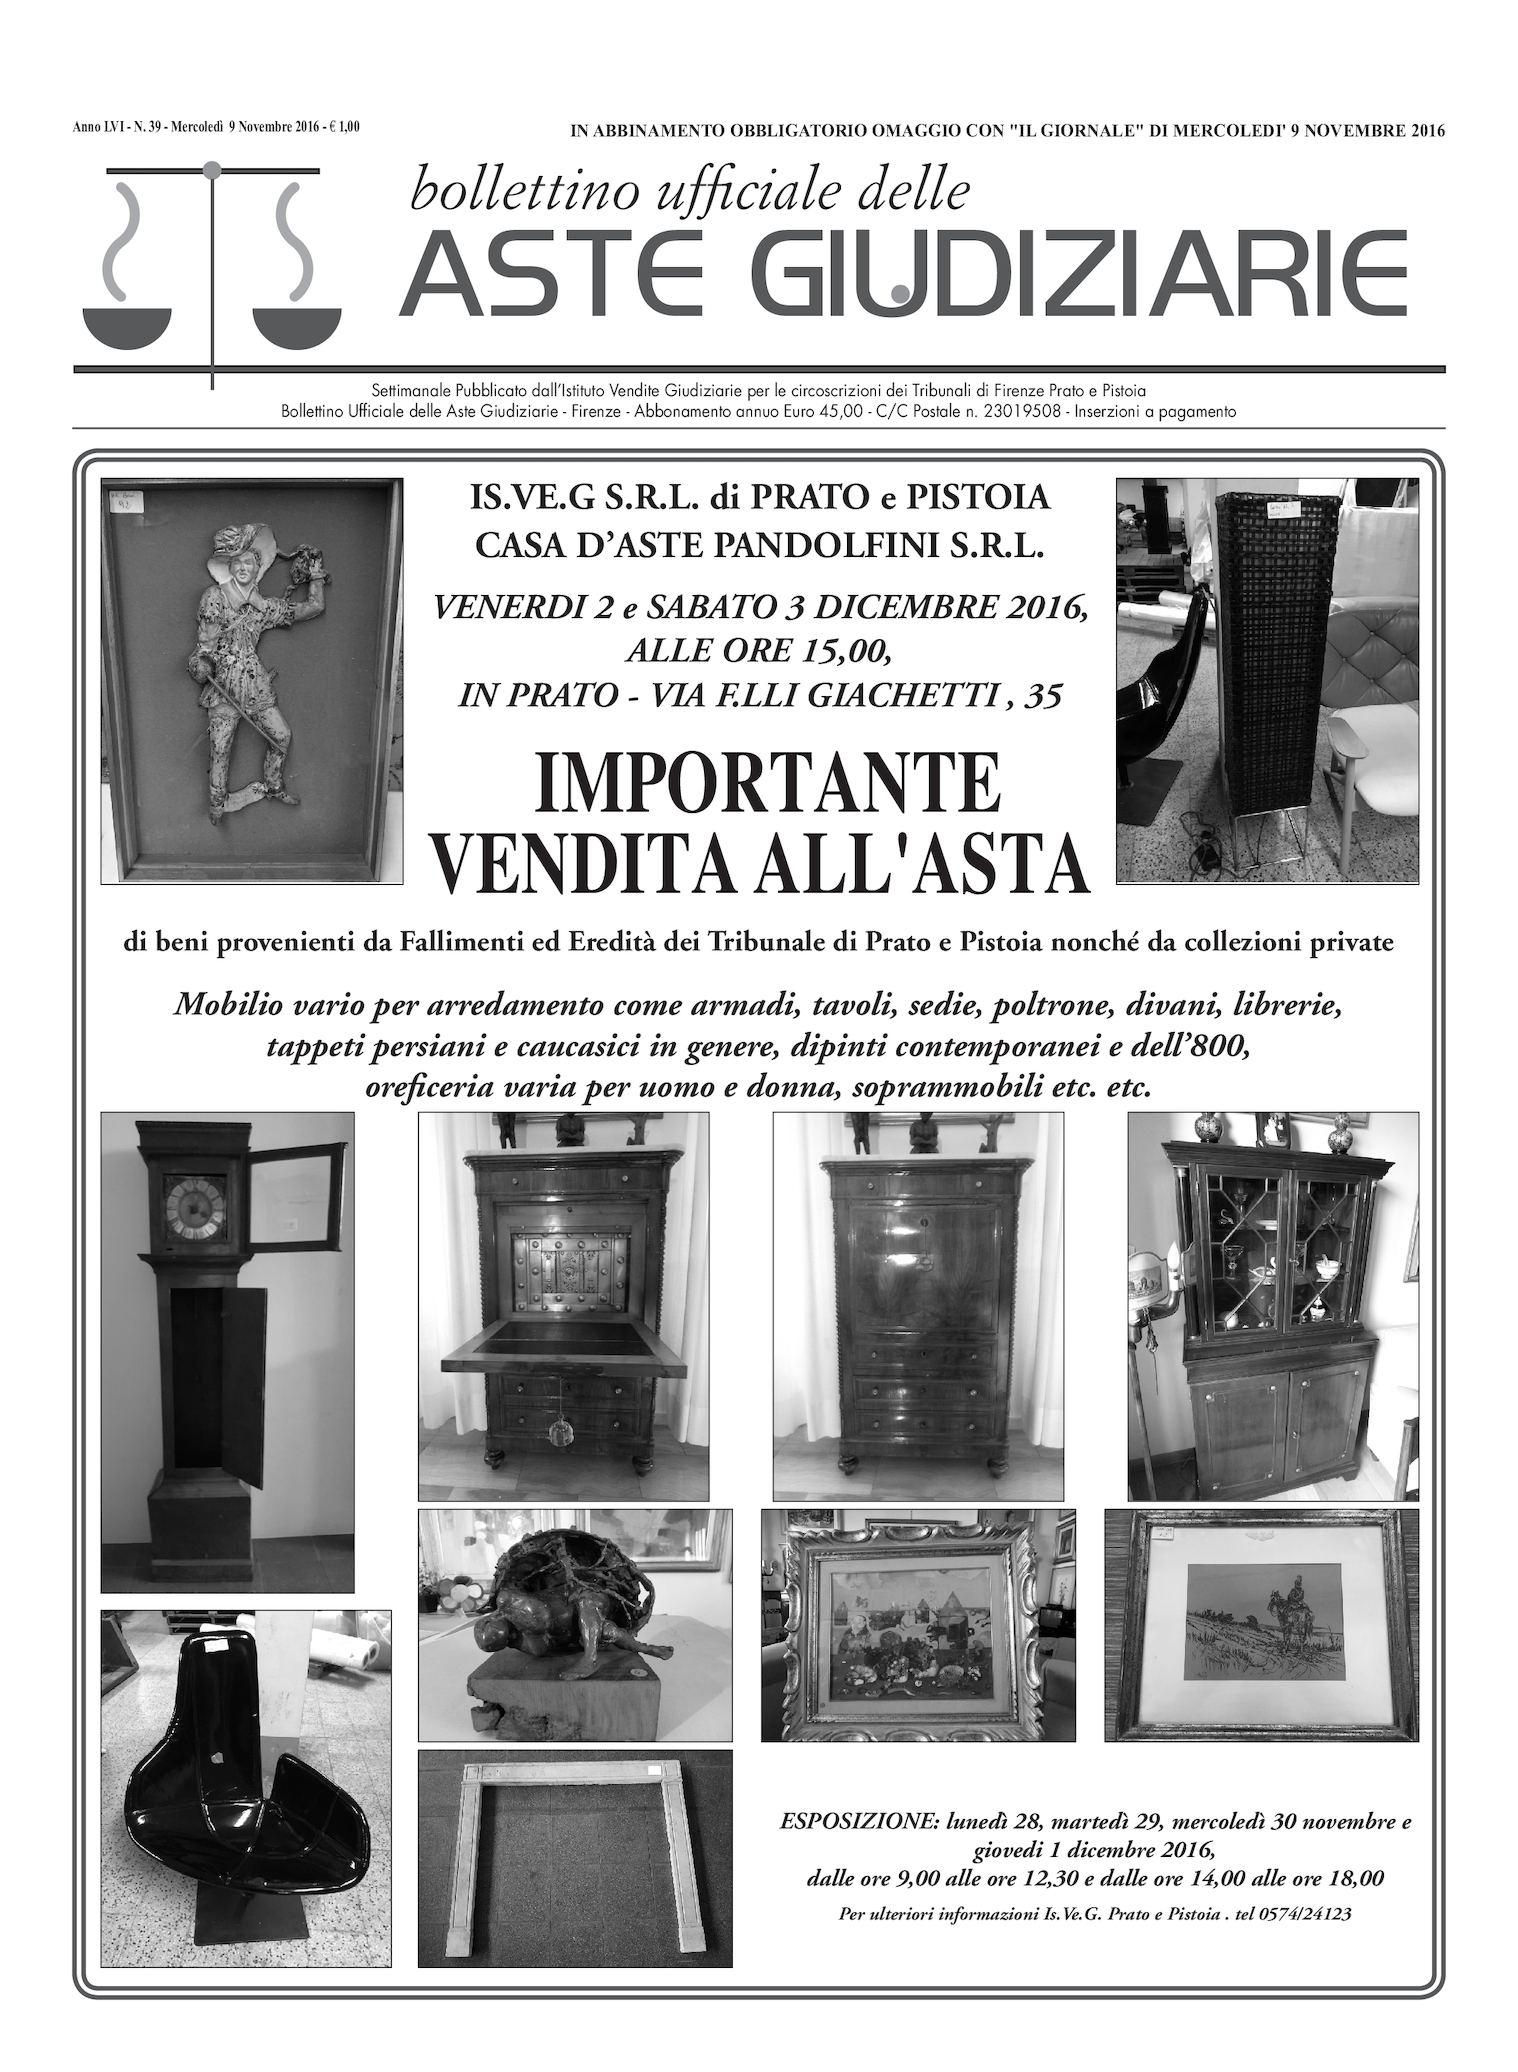 Ln Gazebo E Cuscino Srl.Calameo Documento